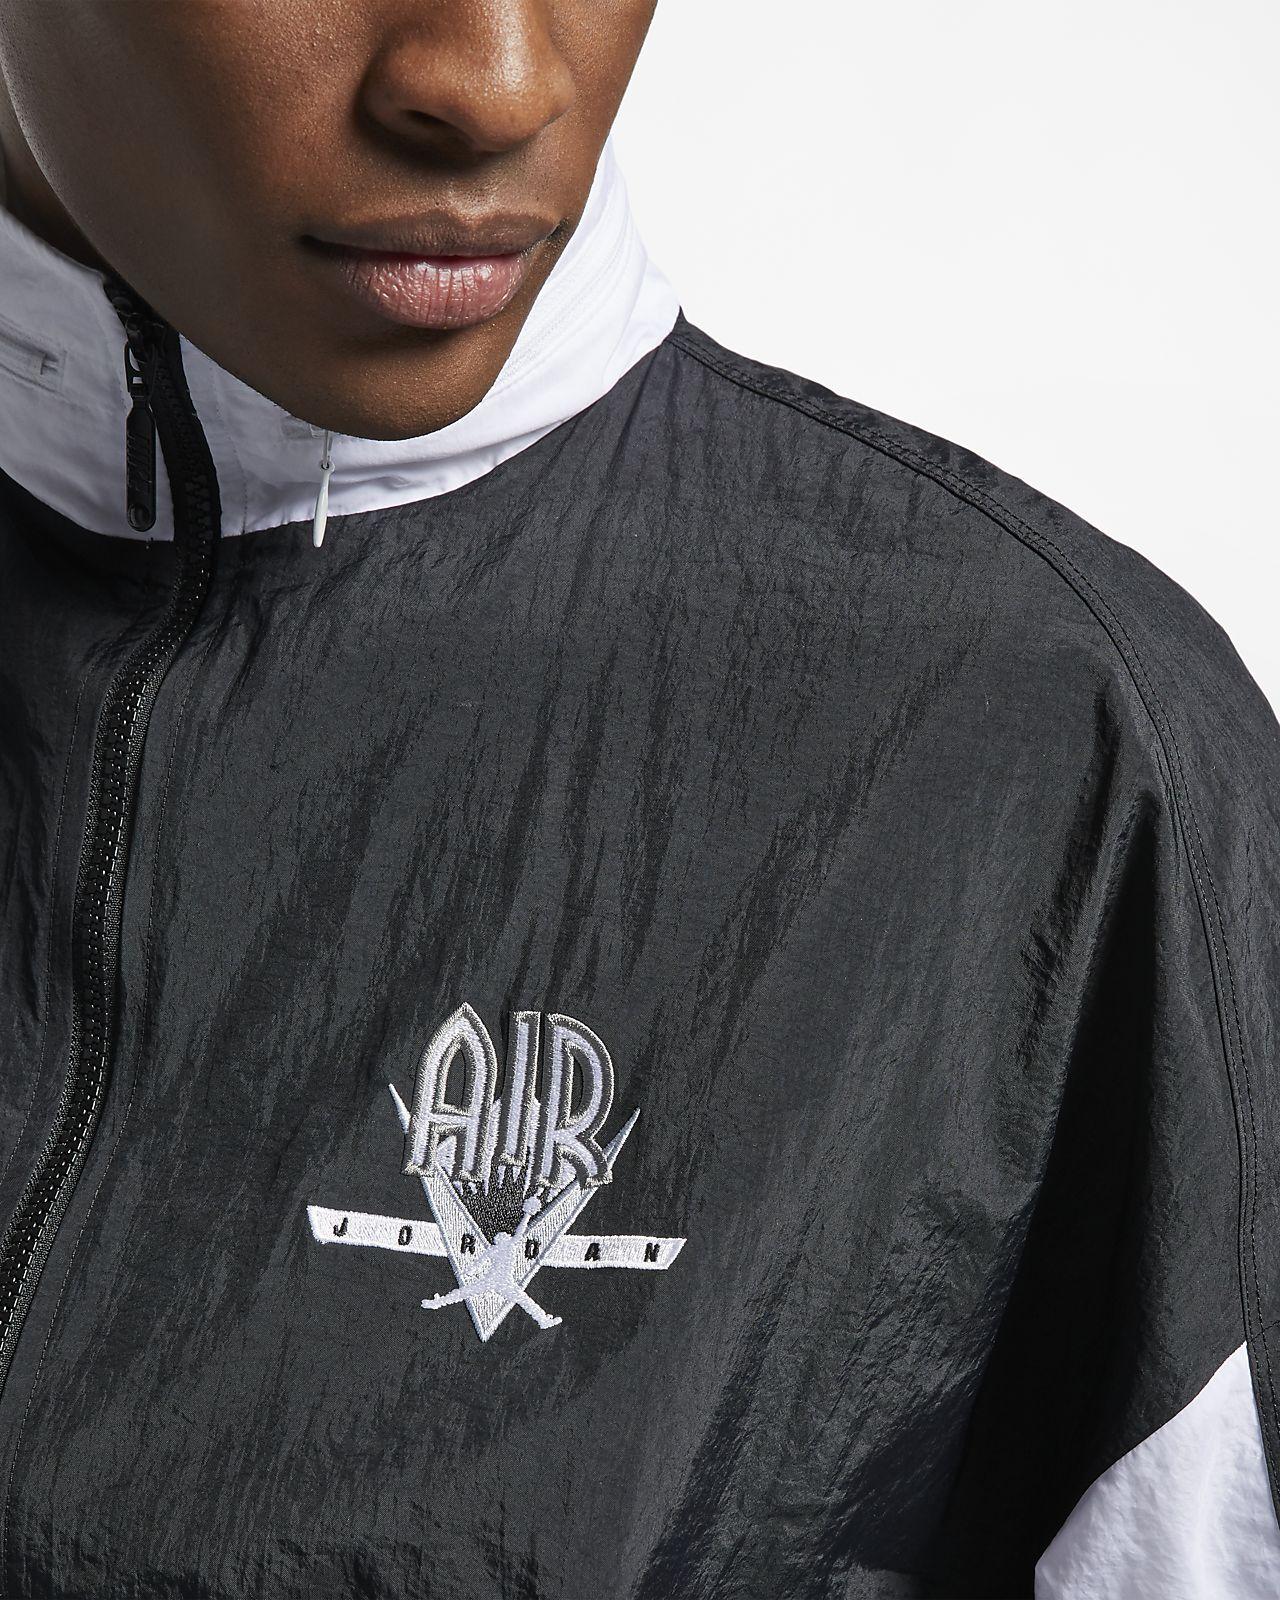 8cf79eca28c ... Jordan Legacy Flight Nostalgia AJ 9 (Loose Fit) Men's Retro Jacket